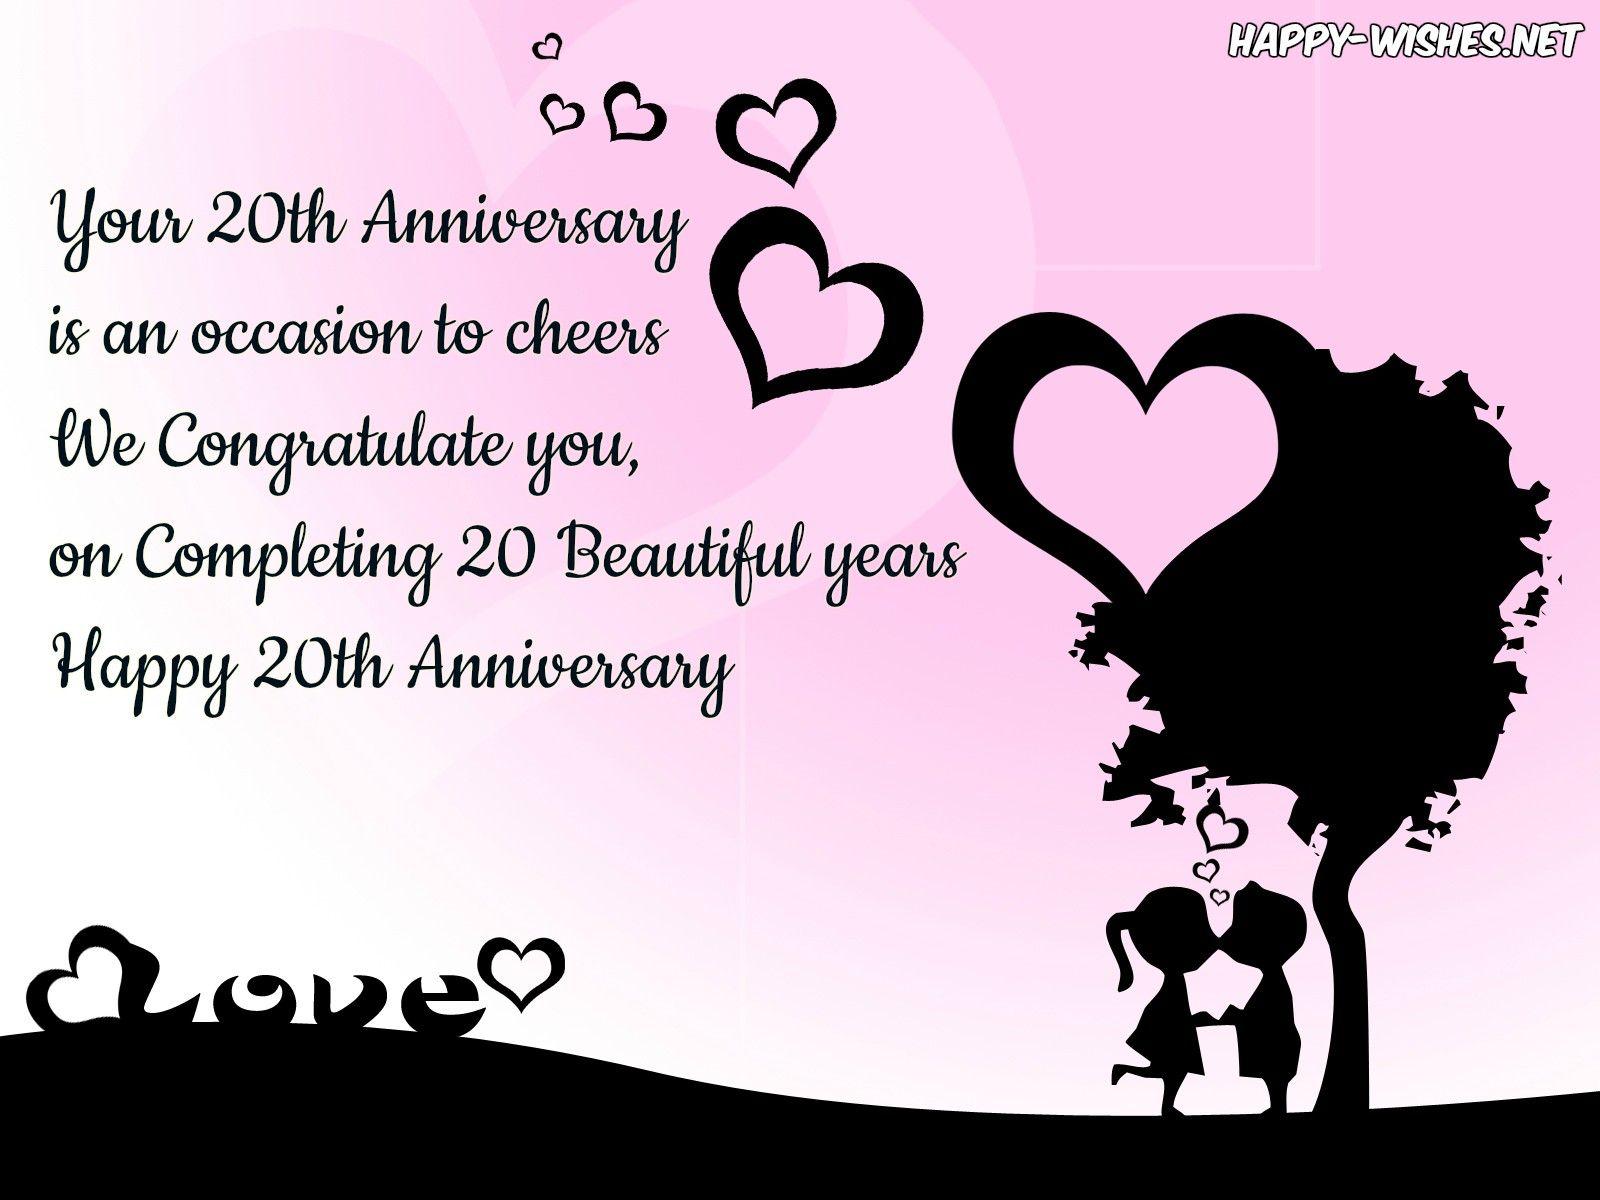 Happy 20th Anniversary Quotes Happy 20th Anniversary 20th Anniversary Quote Anniversary Wishes Quotes